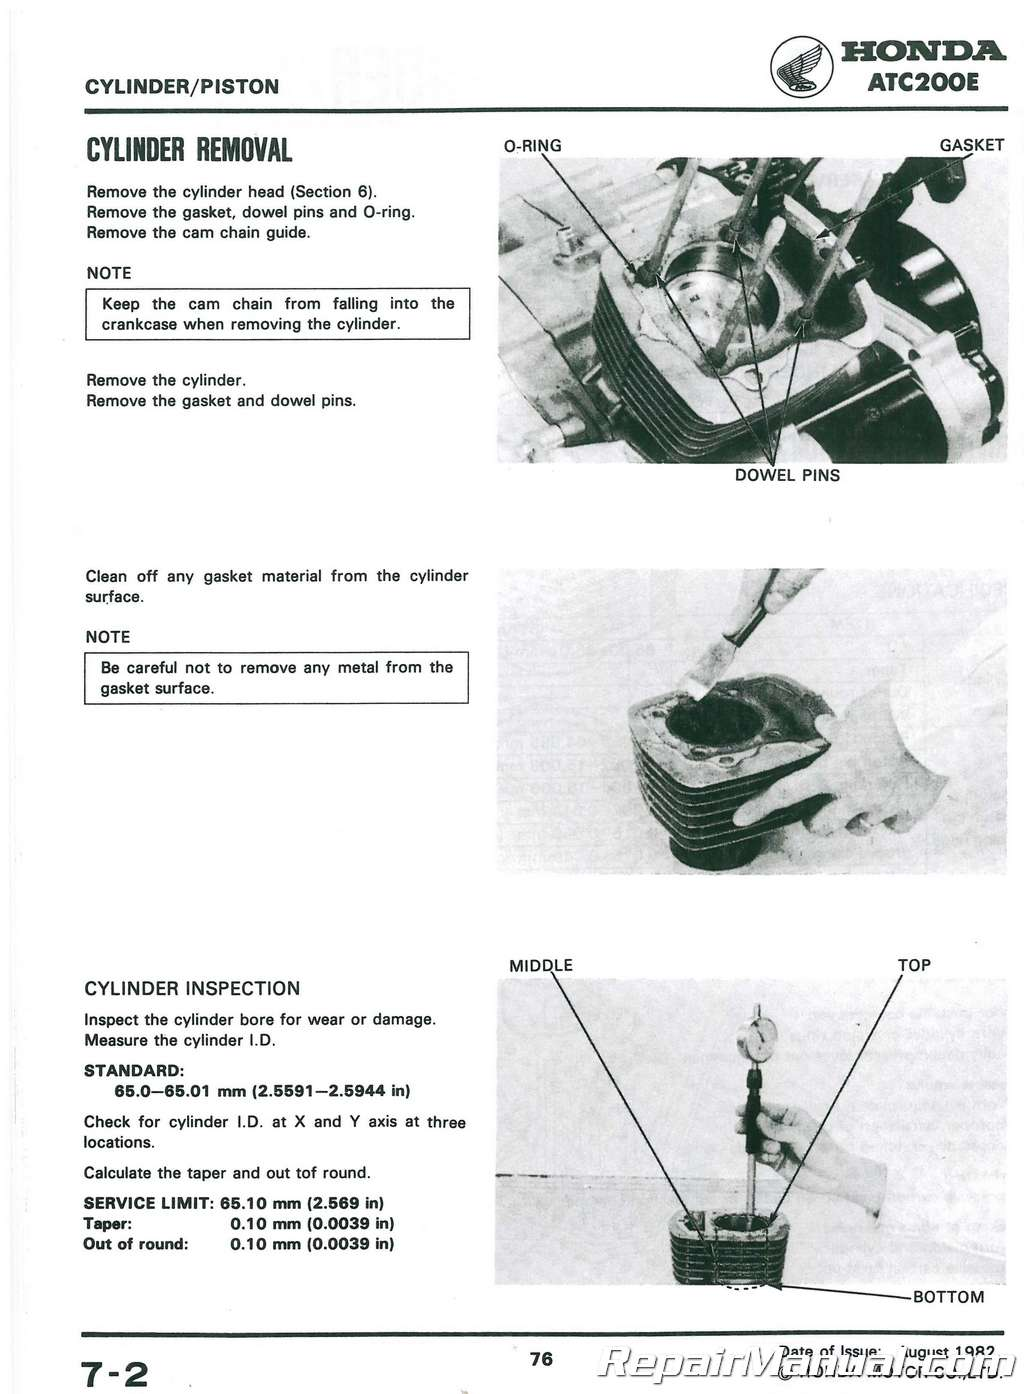 1982 1983 honda atc200e big red atv service manual. Black Bedroom Furniture Sets. Home Design Ideas